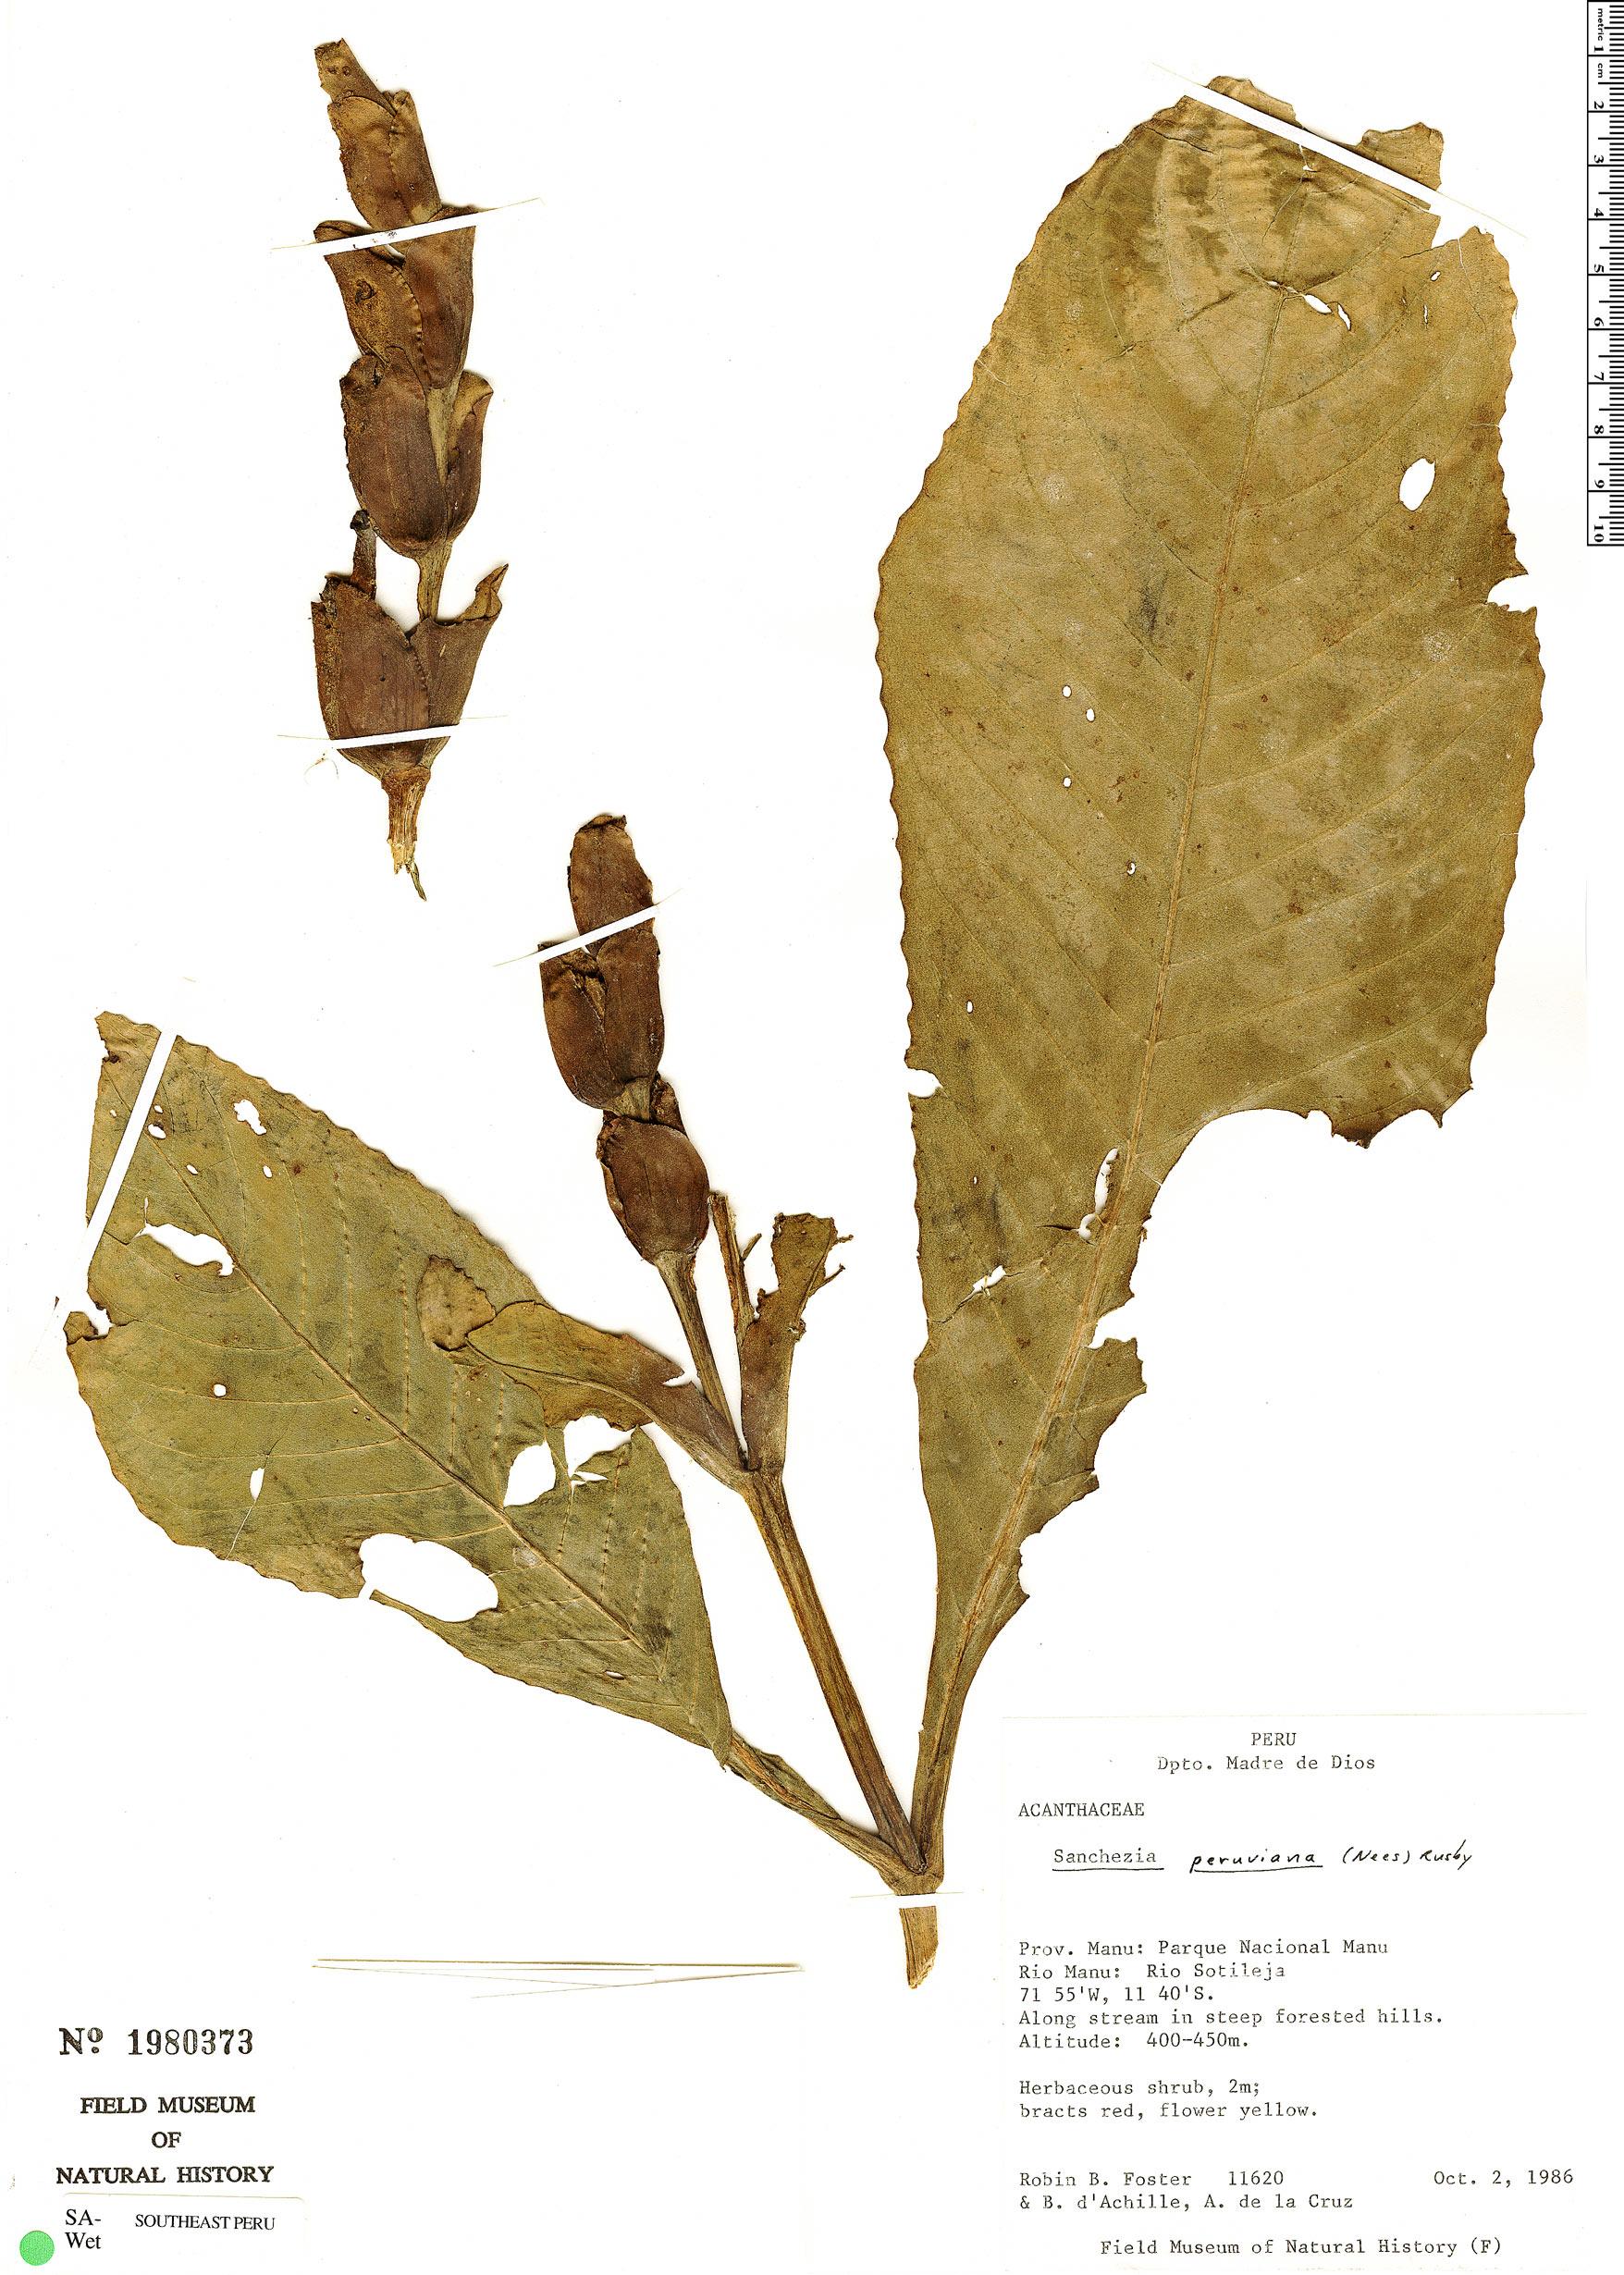 Specimen: Sanchezia oblonga